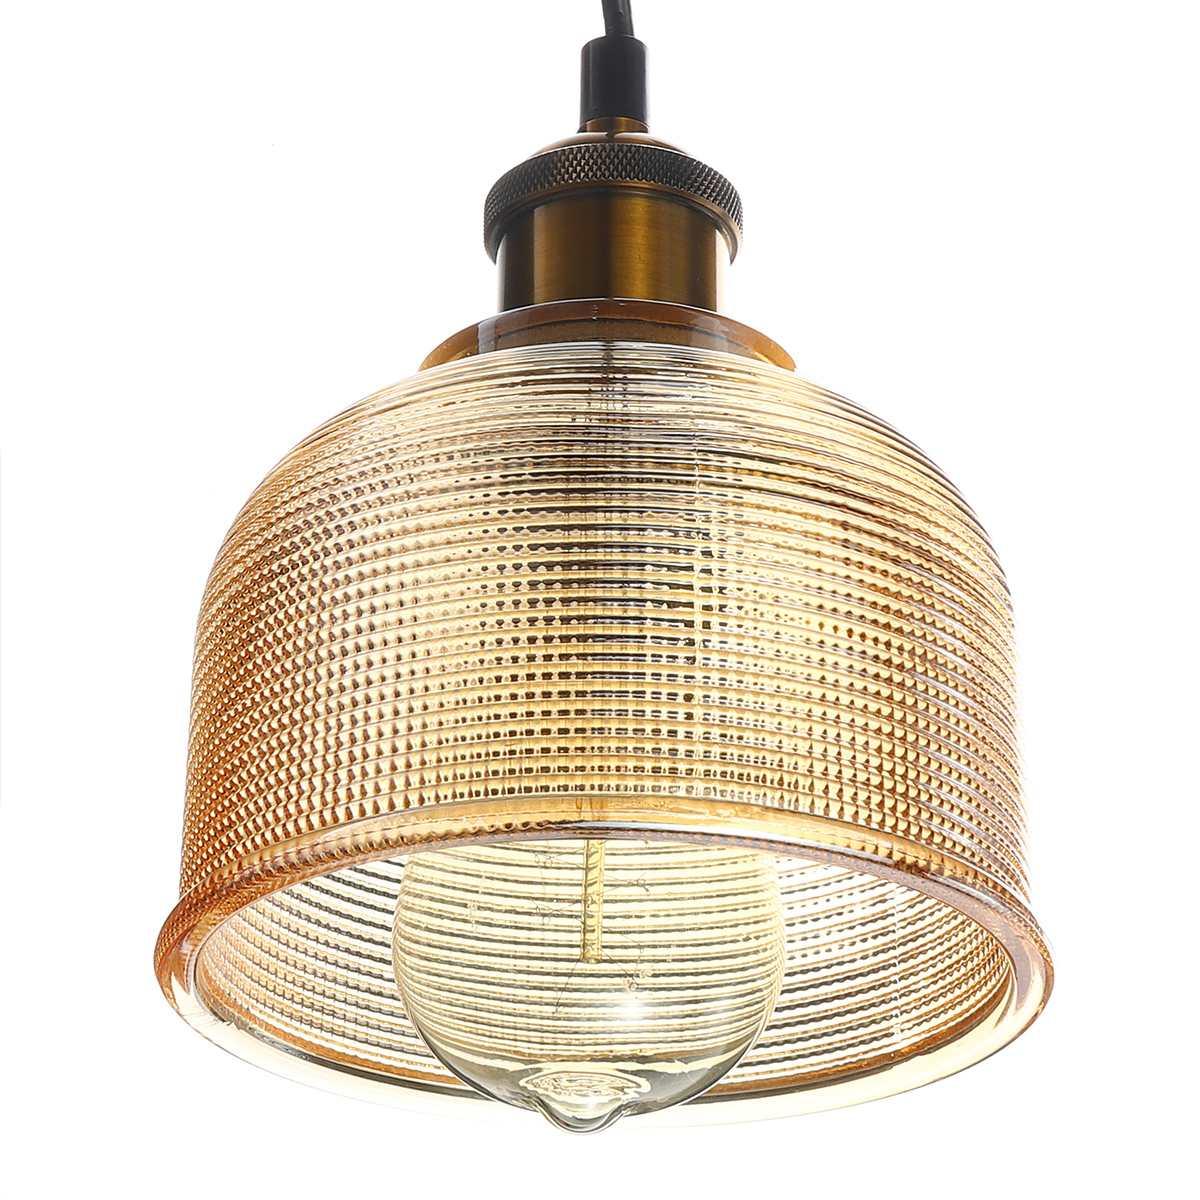 industrial estilo loft lampada de vidro estilo loft luz parede 05